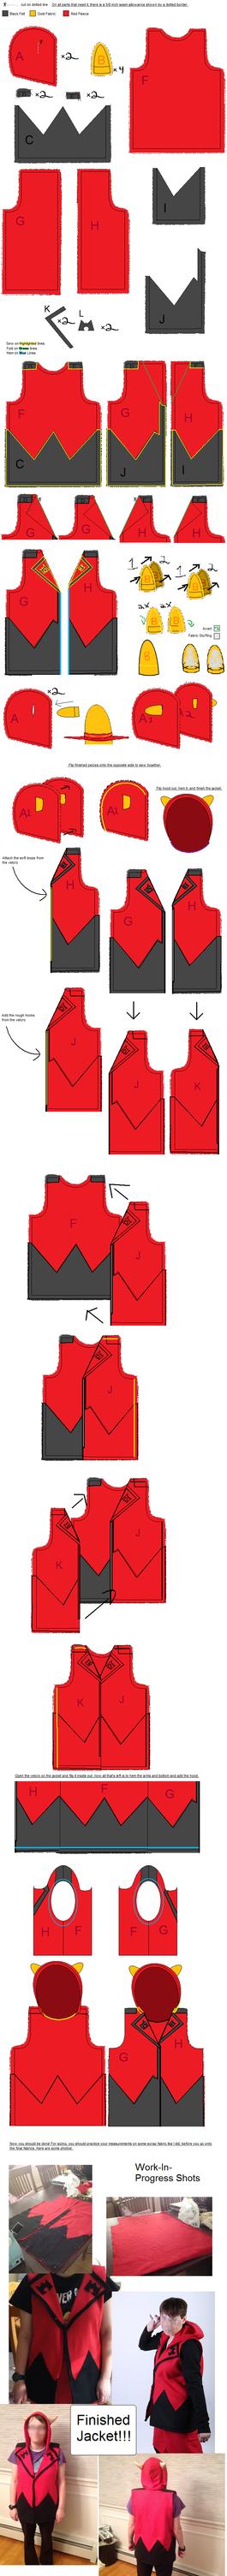 Team Magma Admin Tabitha Jacket Sewing Tutorial by Idellechi